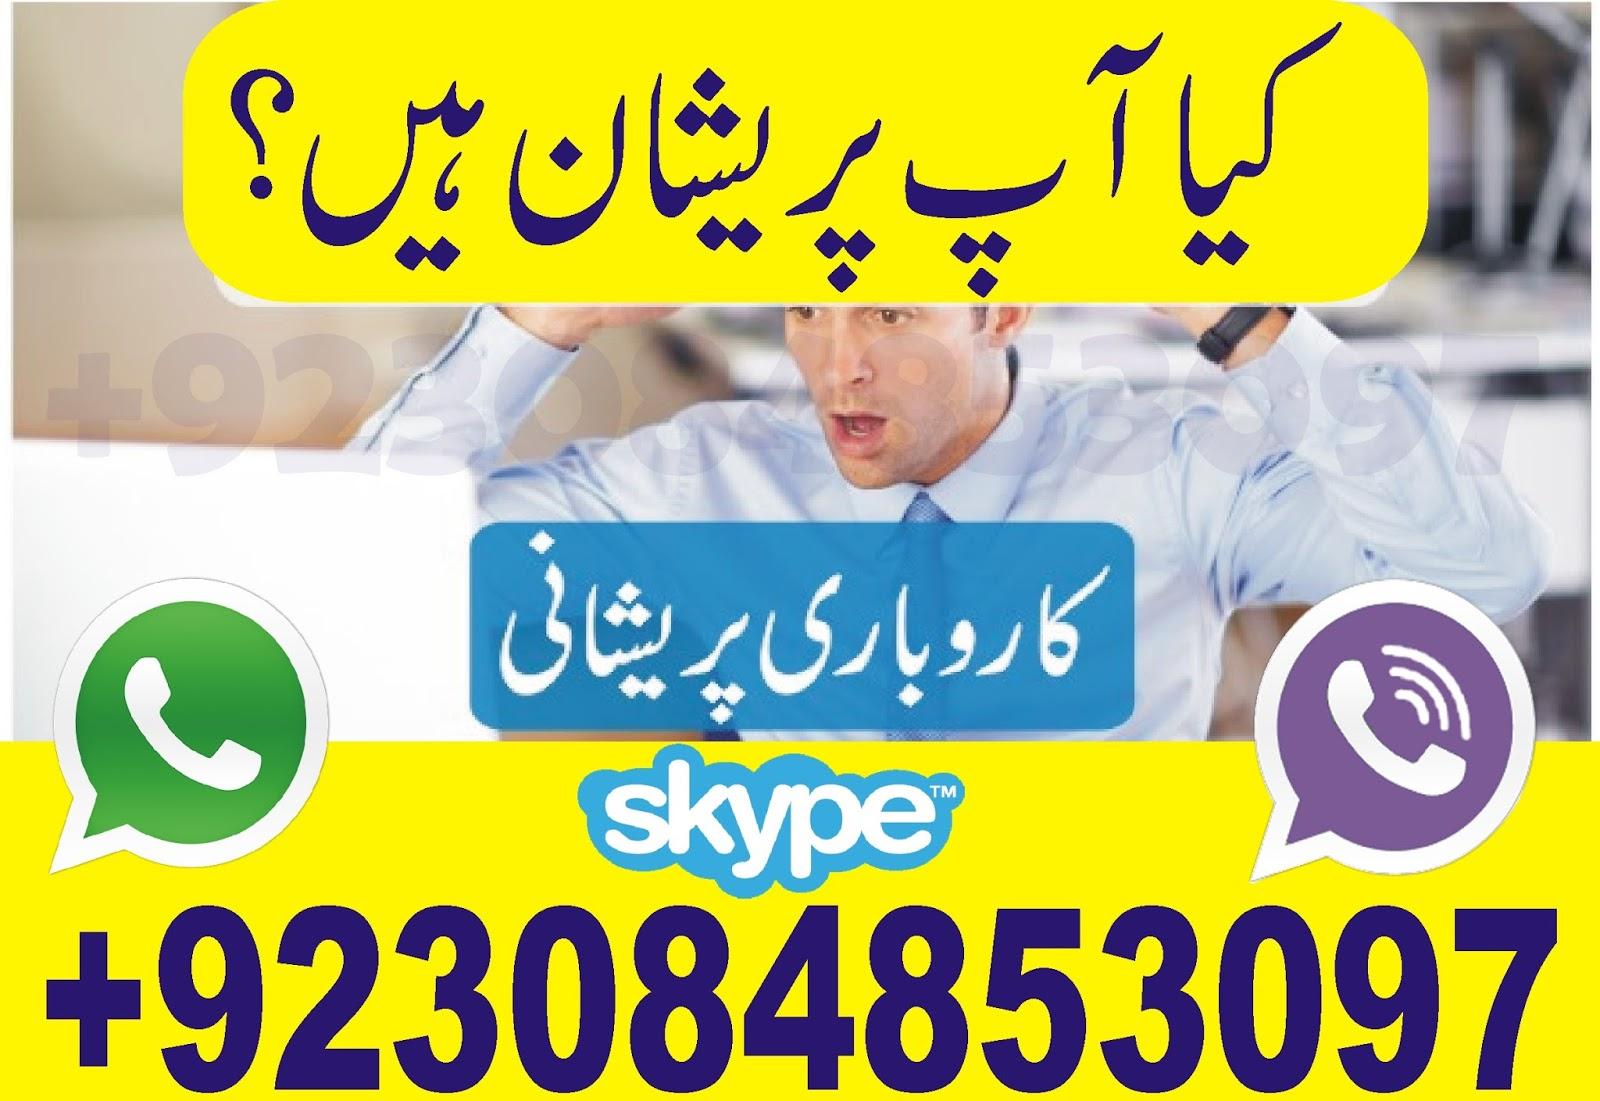 Shadi online chat